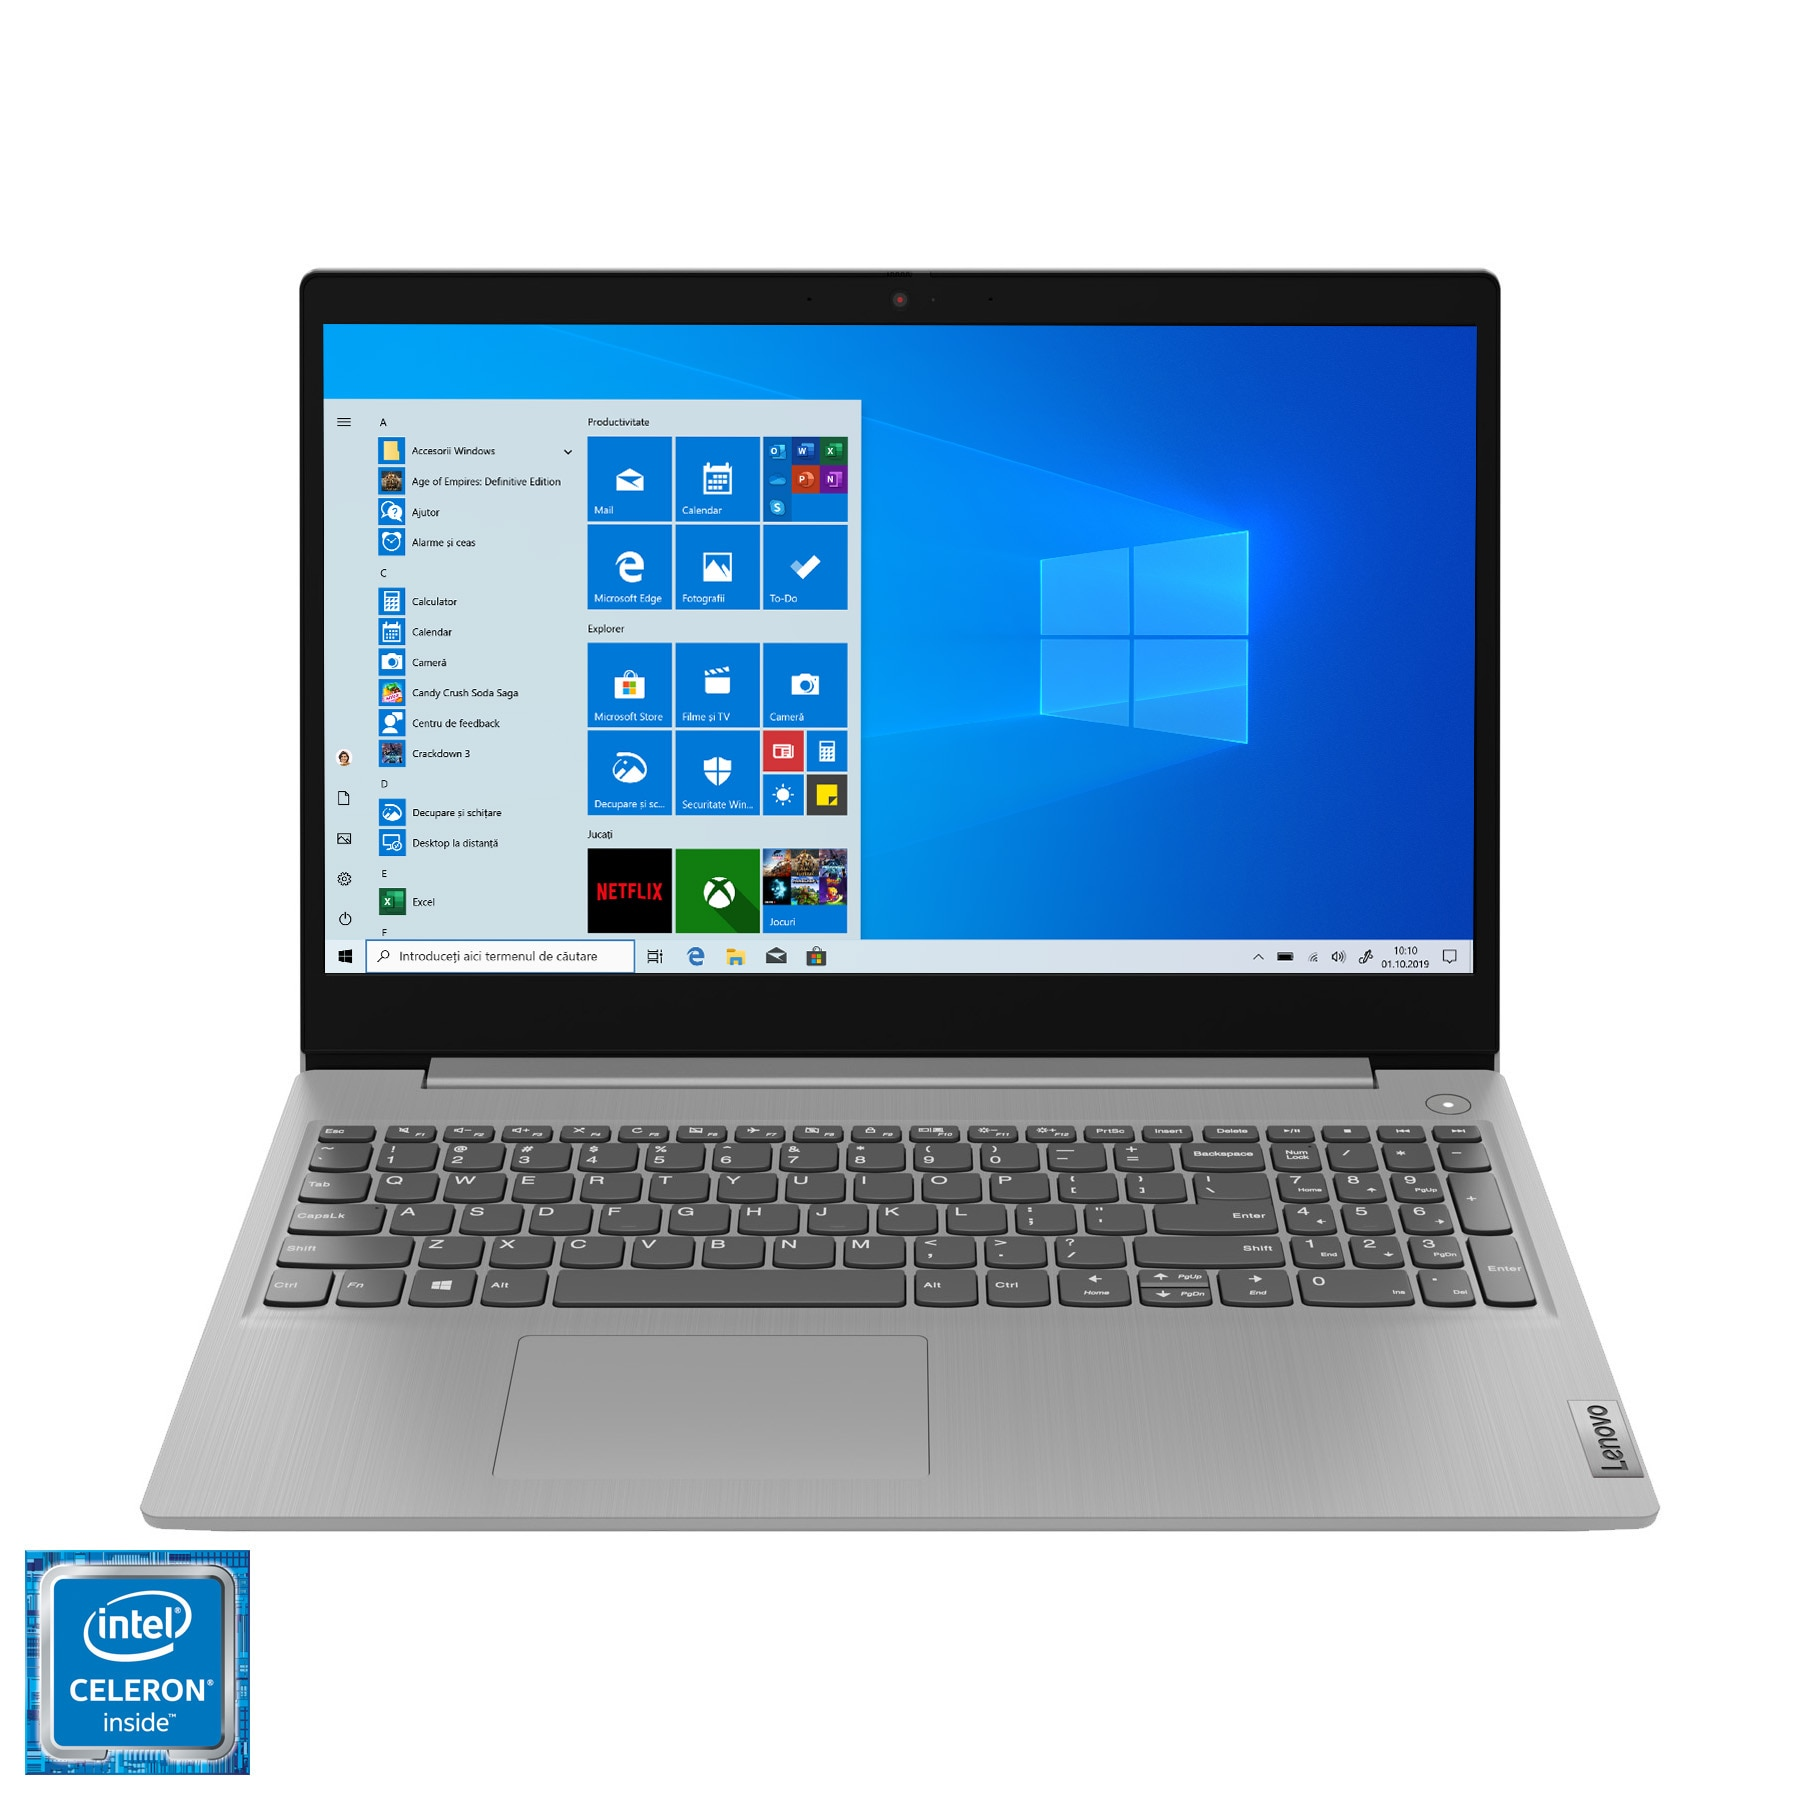 "Fotografie Laptop Lenovo IdeaPad 3 15IML05 cu procesor Intel® Celeron® 5205U, 15.6"" HD, 4GB, 128GB SSD, Intel® UHD Graphics, Windows 10 Home S, Platinum Grey"